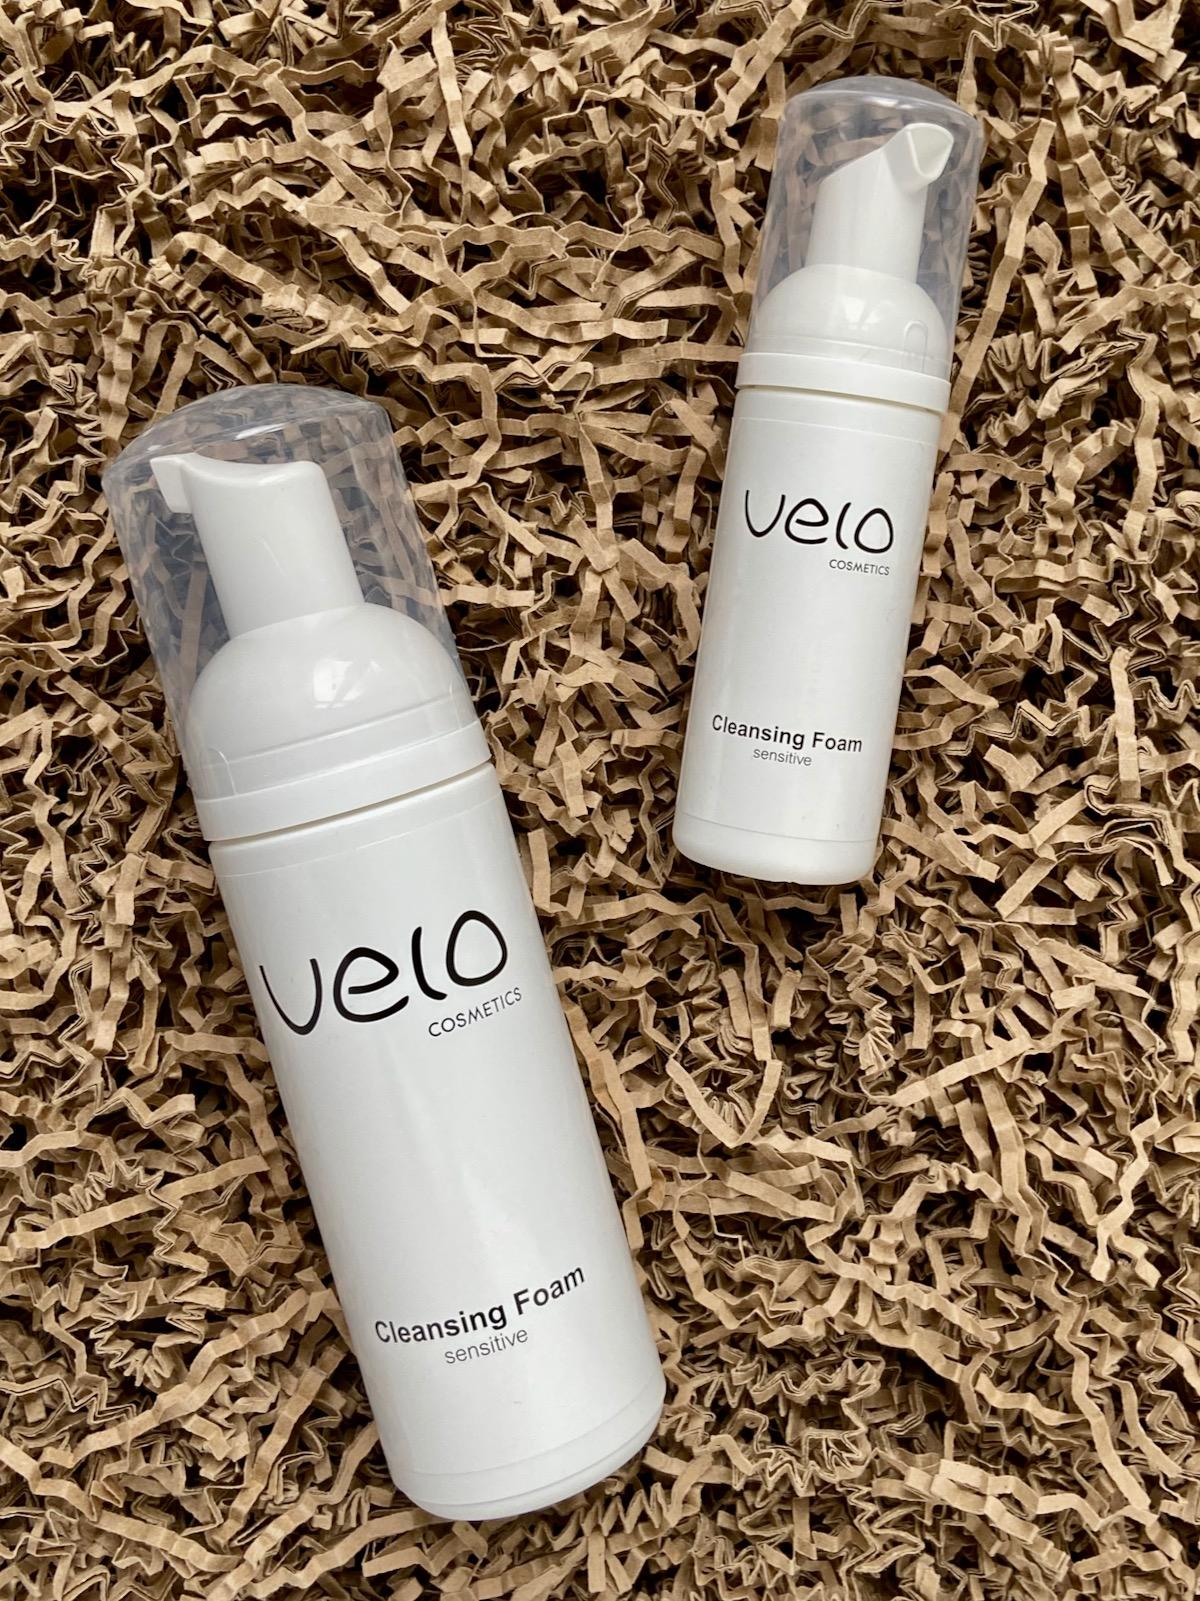 Velo Cosmetics Cleansing Foam